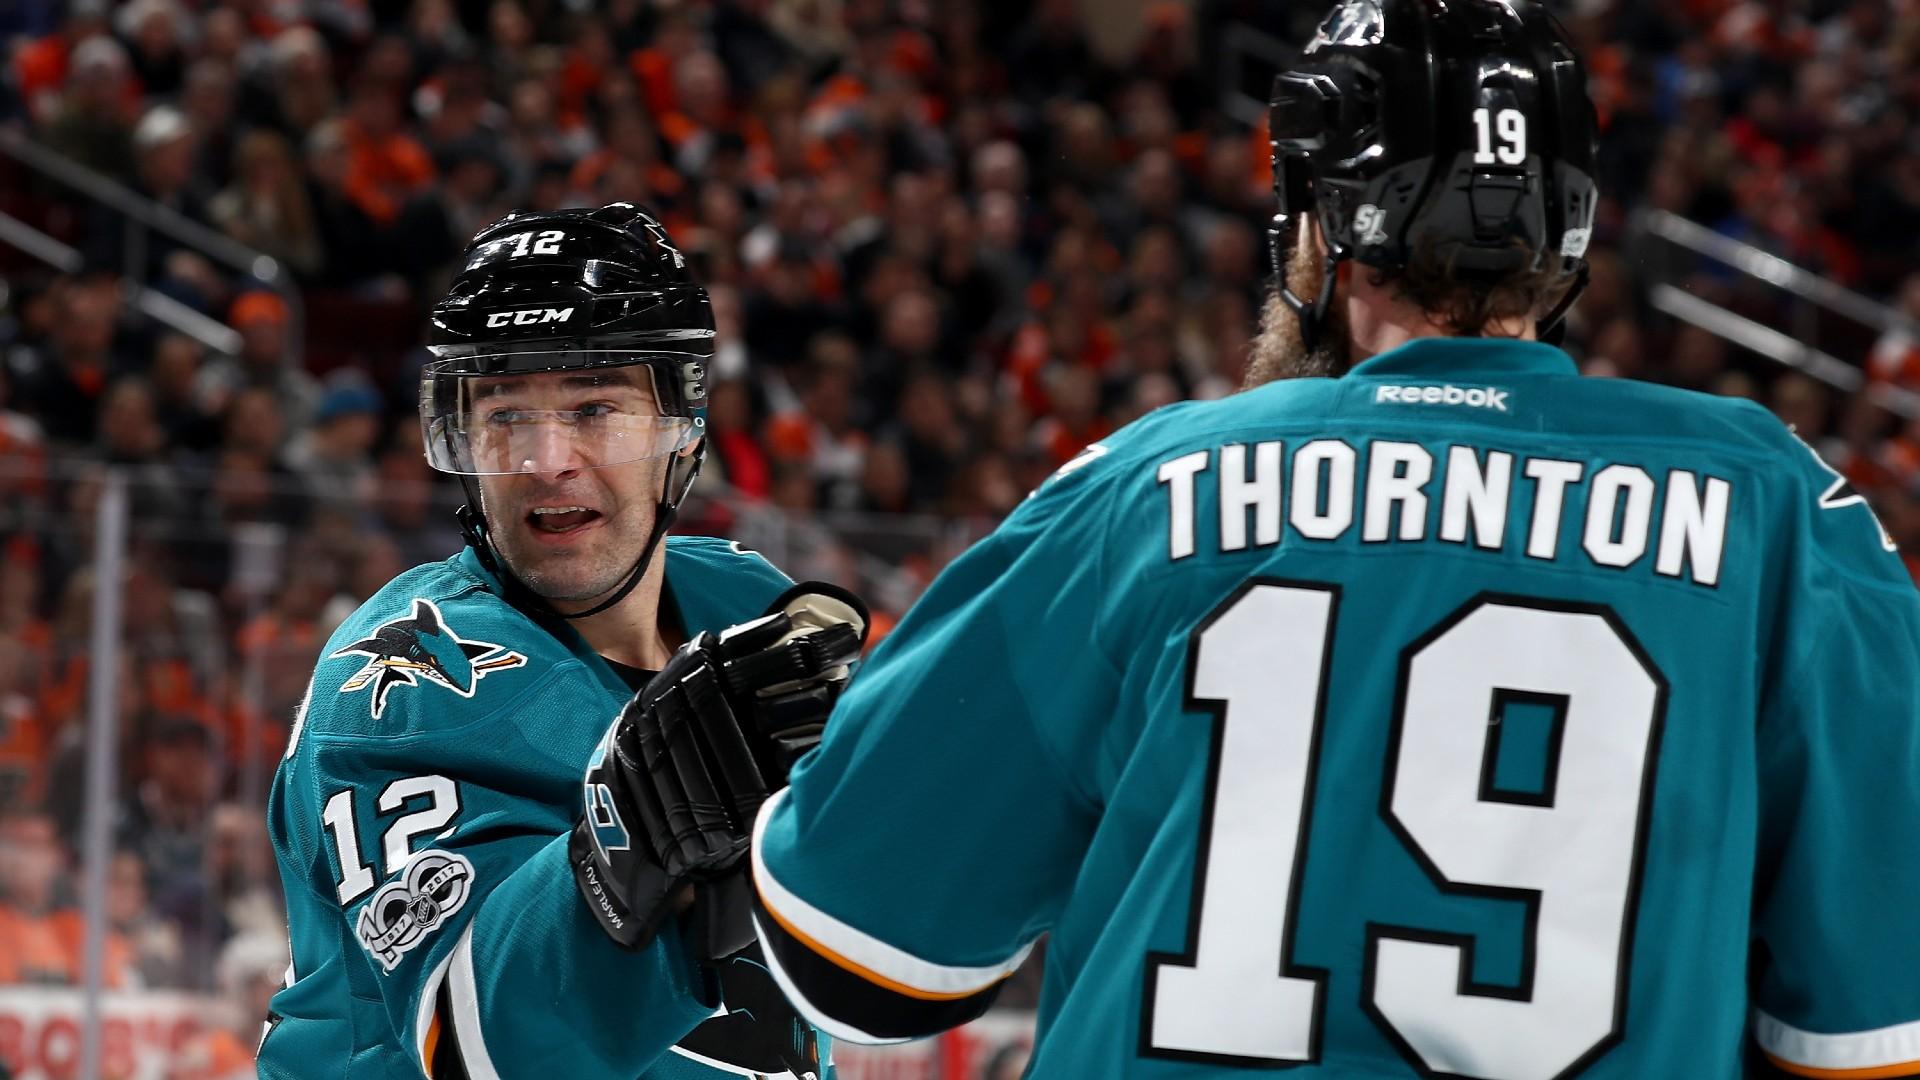 Leafs' Joe Thornton has congratulated Patrick Marleau on his NHL record